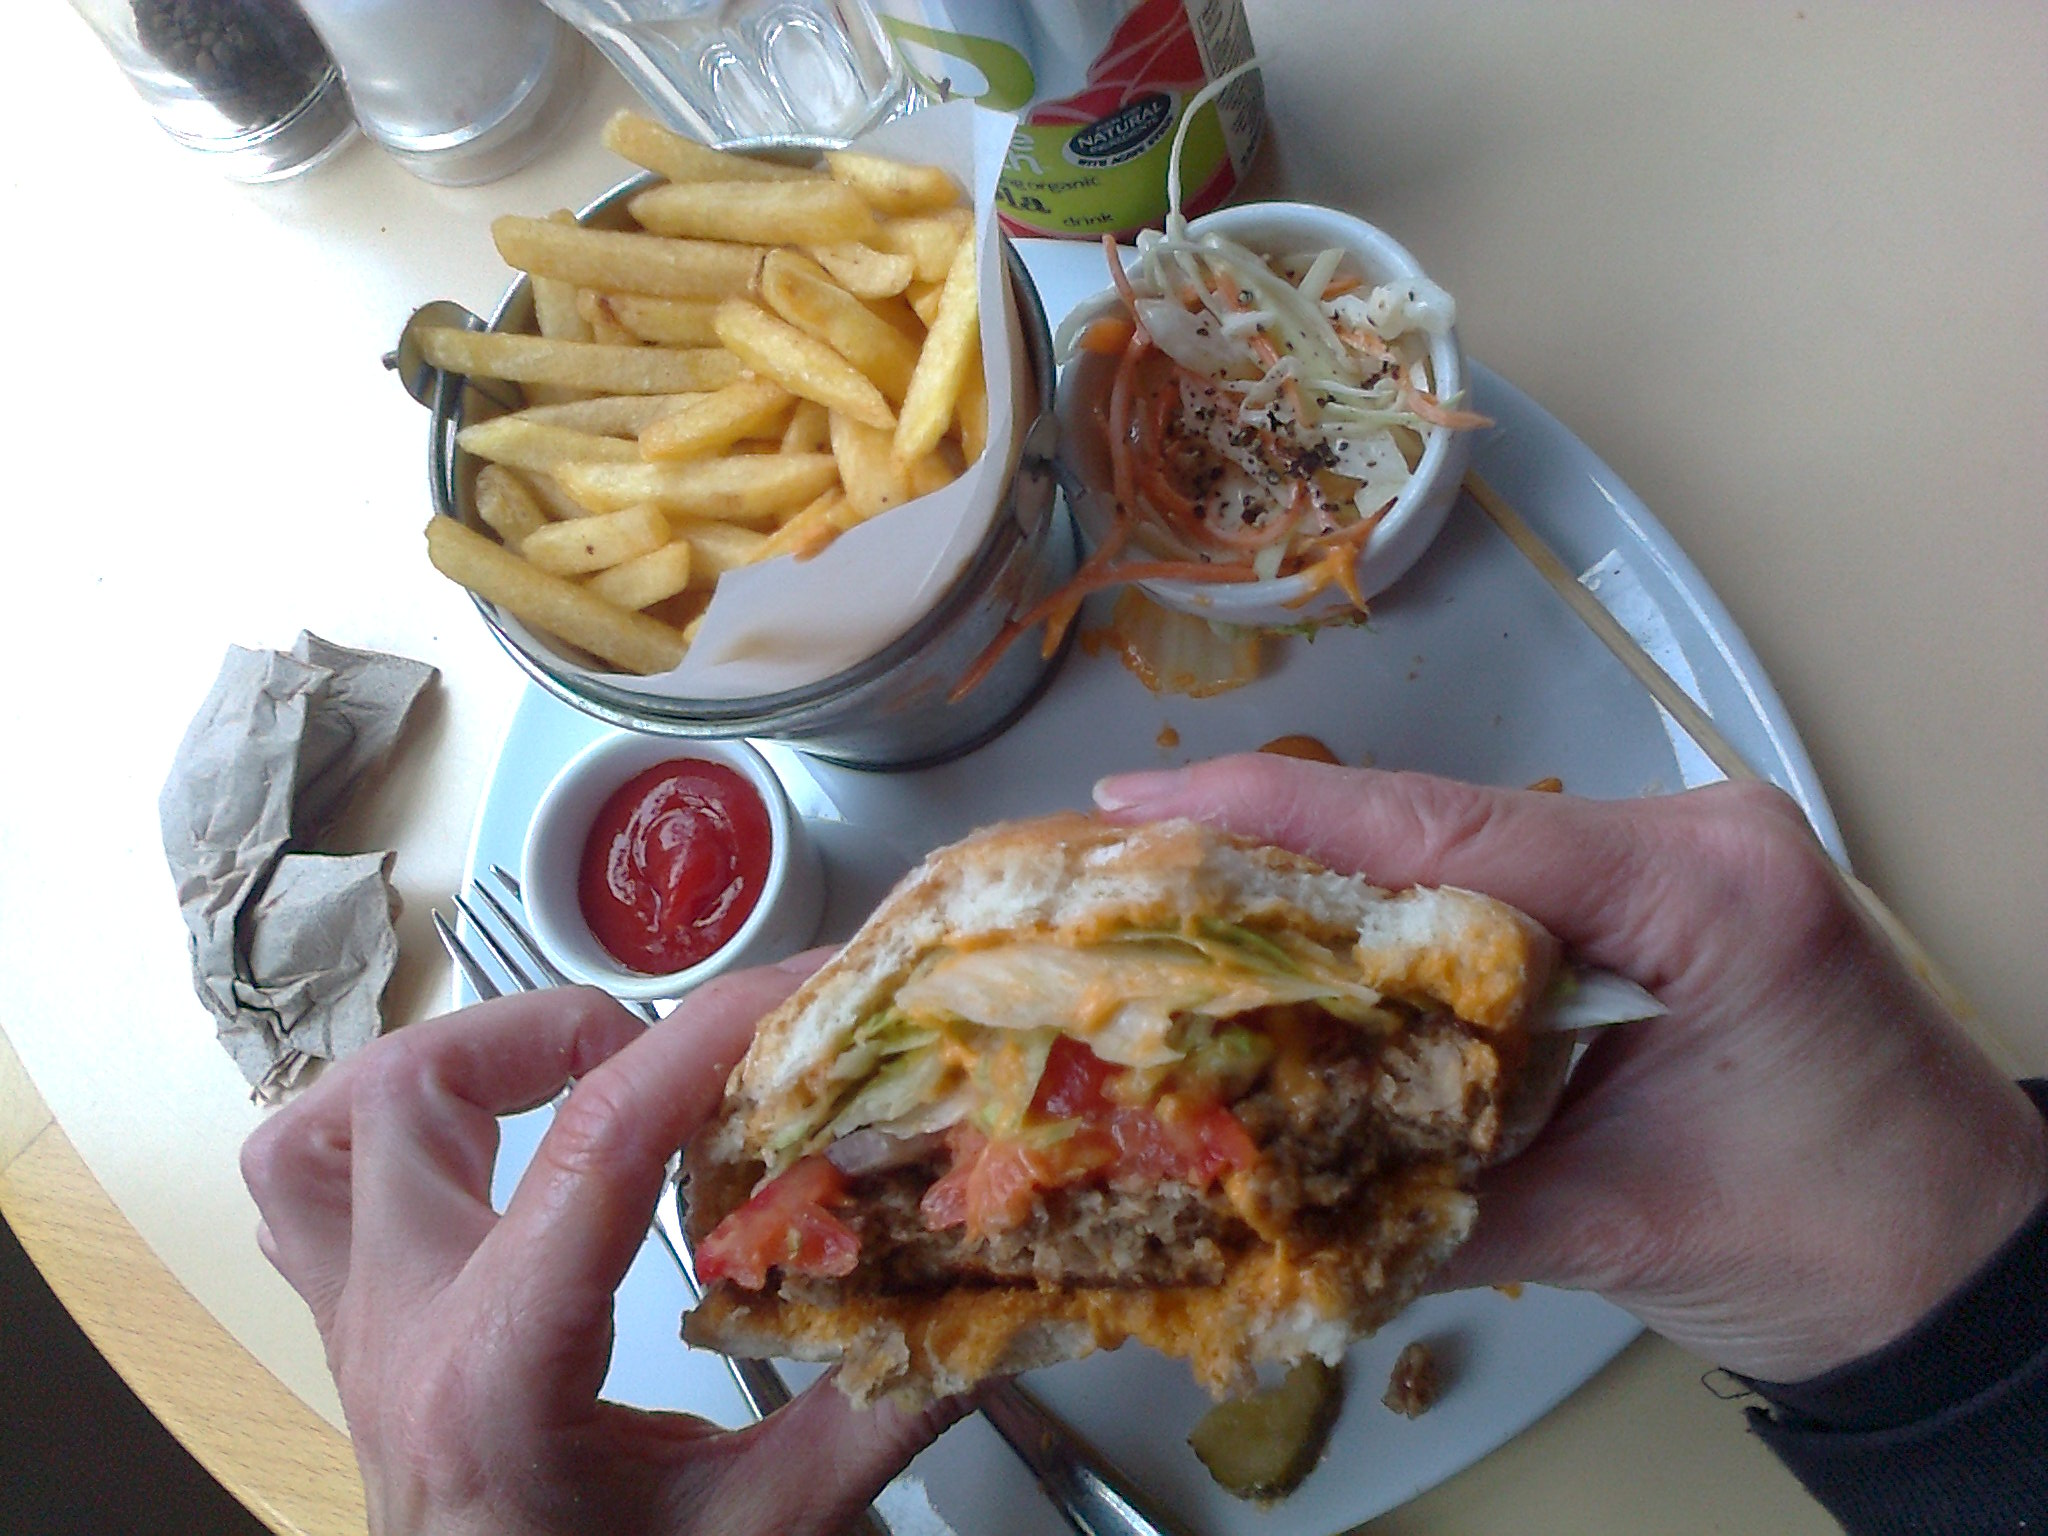 vegan burger from VBites